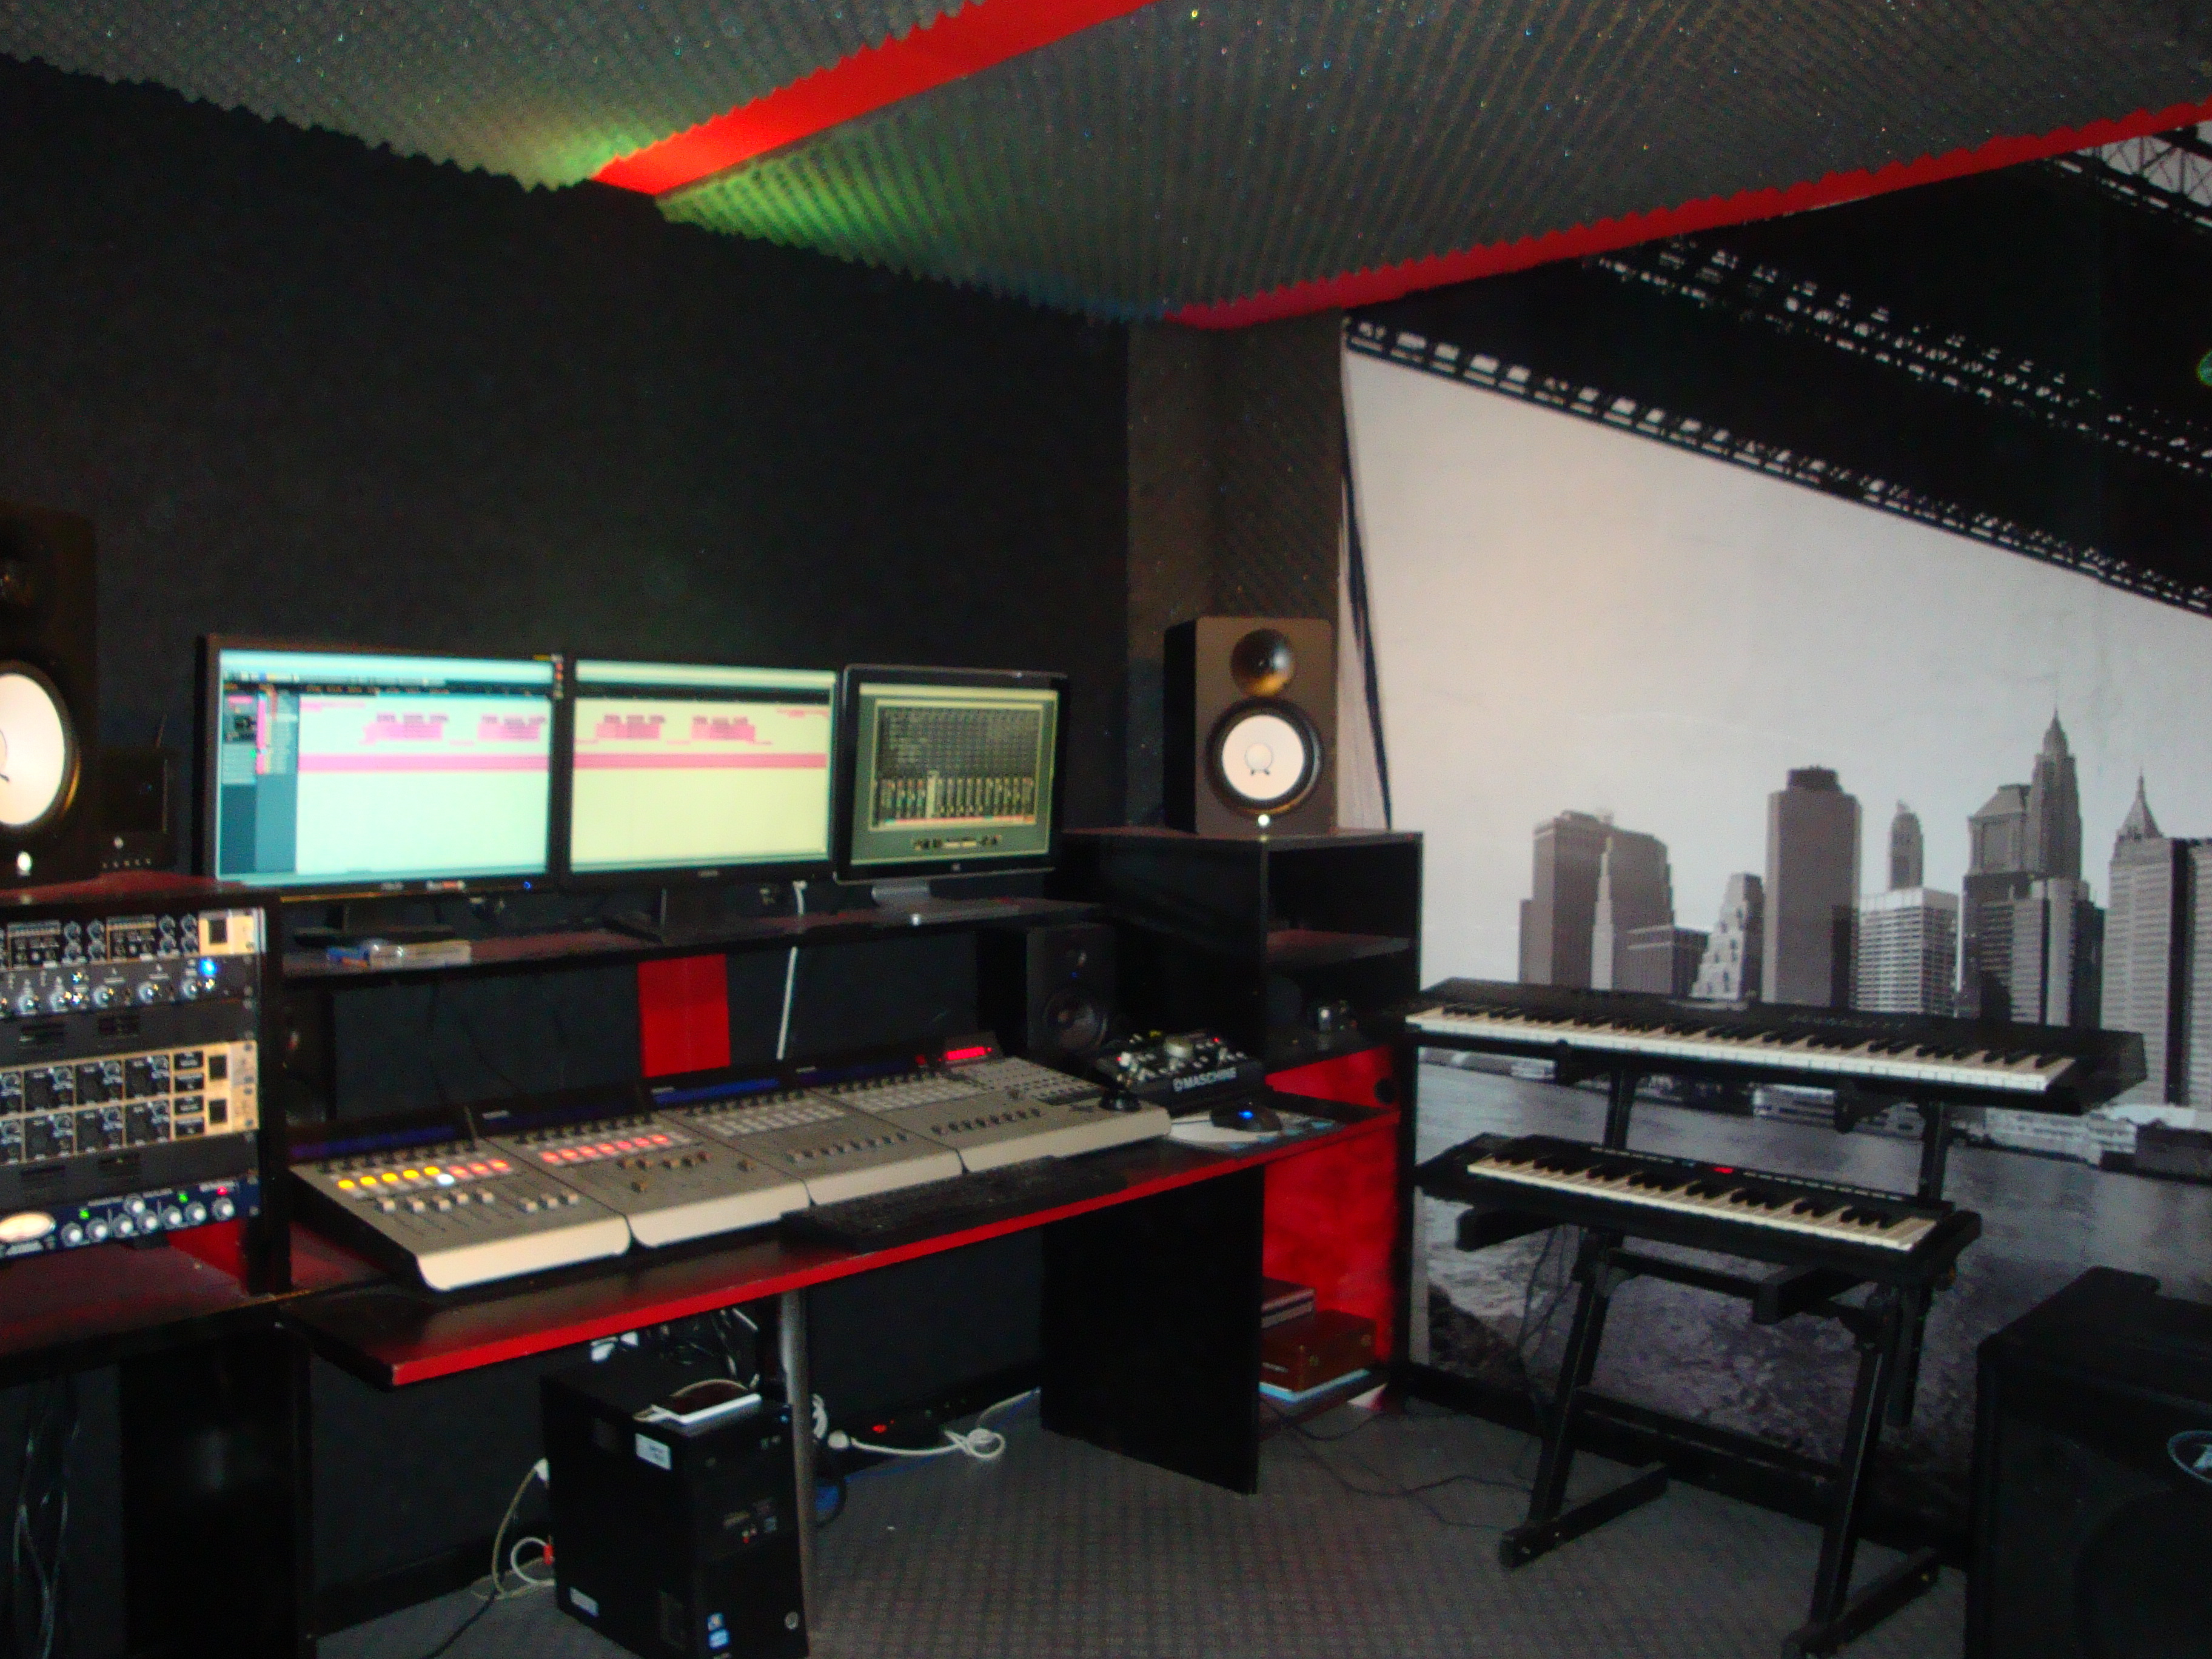 studio d 39 enregistrement le studio 44 nantes bouguenais 44340. Black Bedroom Furniture Sets. Home Design Ideas